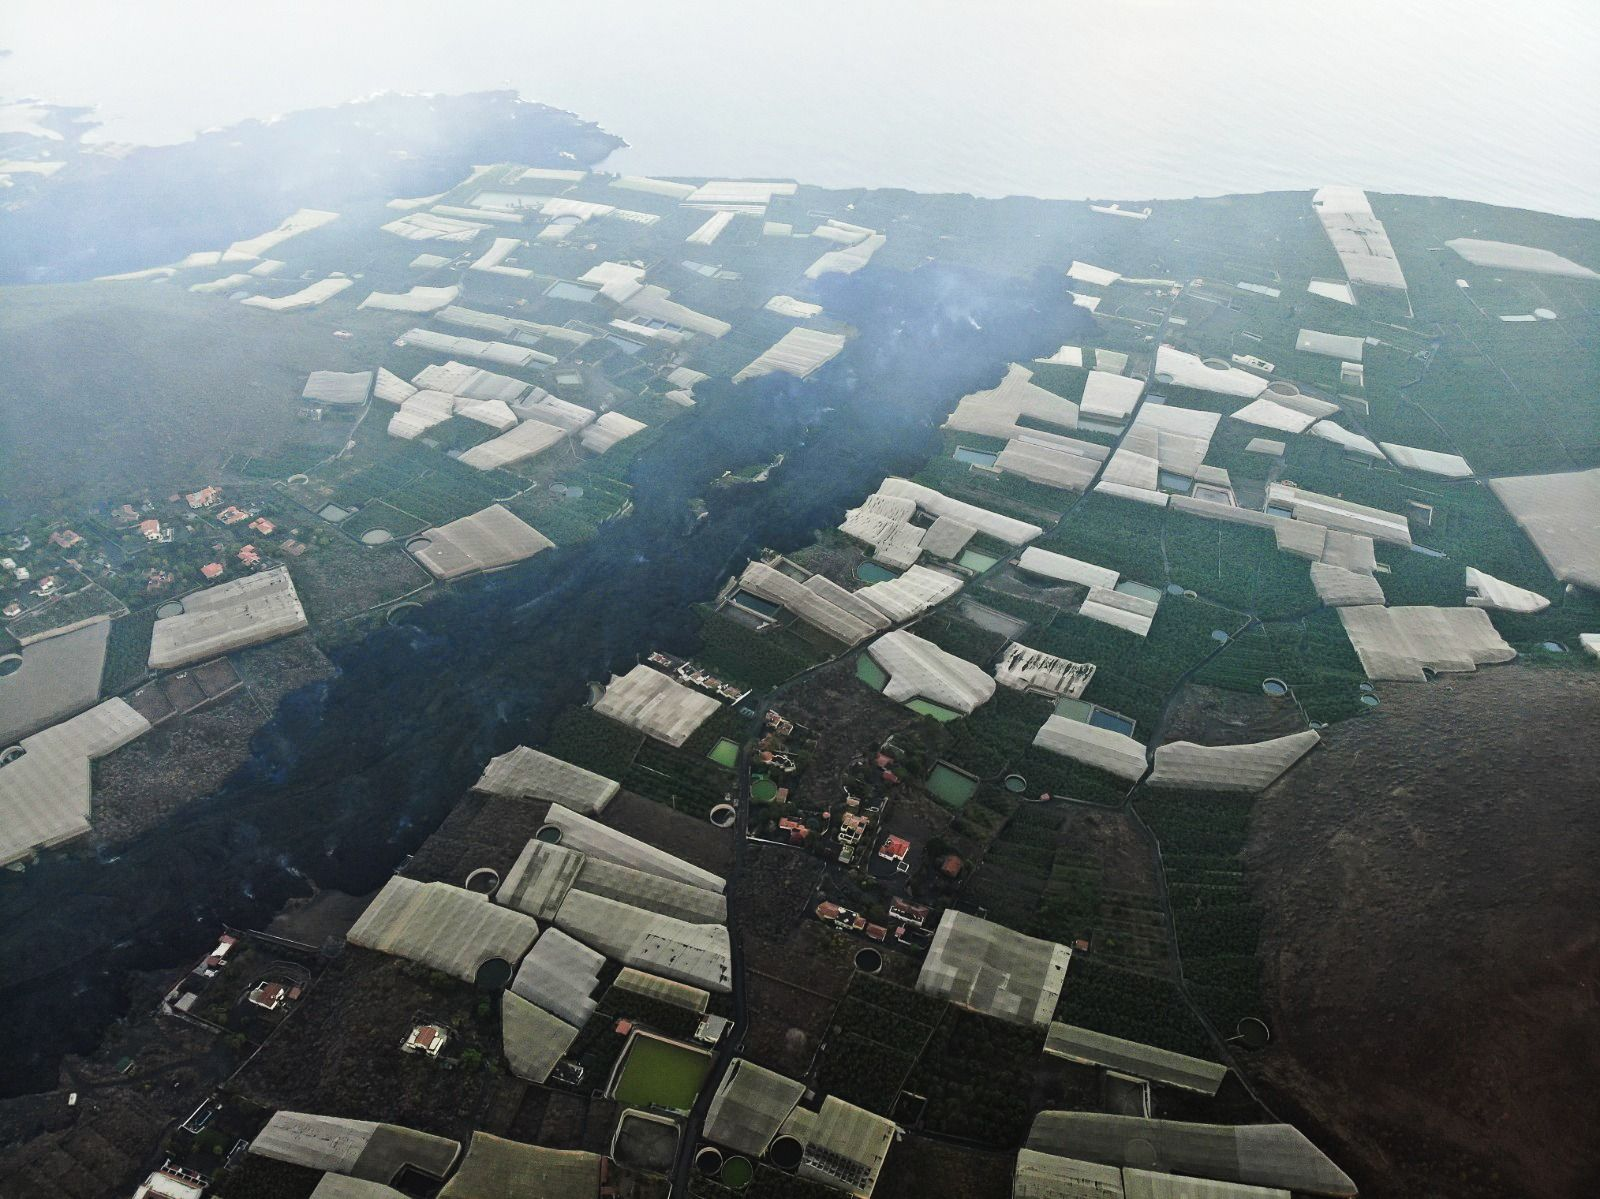 Avance de la colada del volcán de La Palma